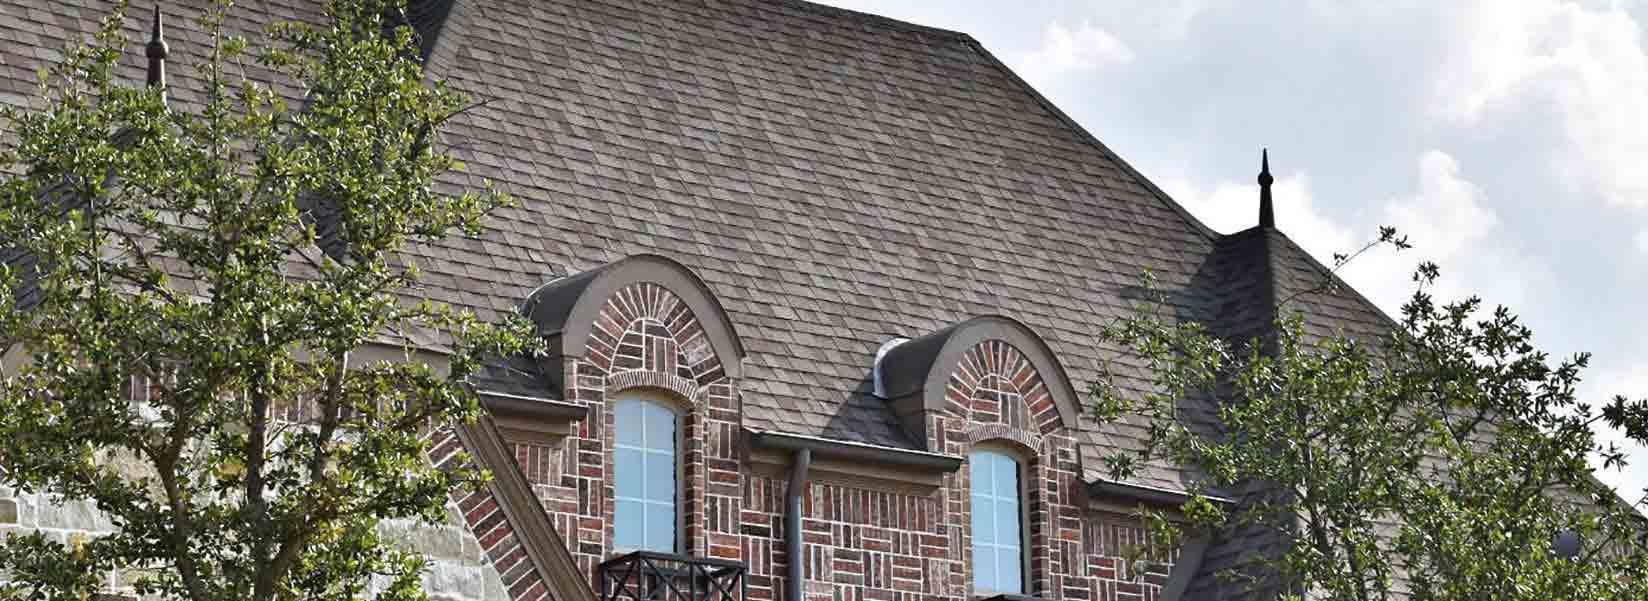 Asphalt Shingle Roof Installation